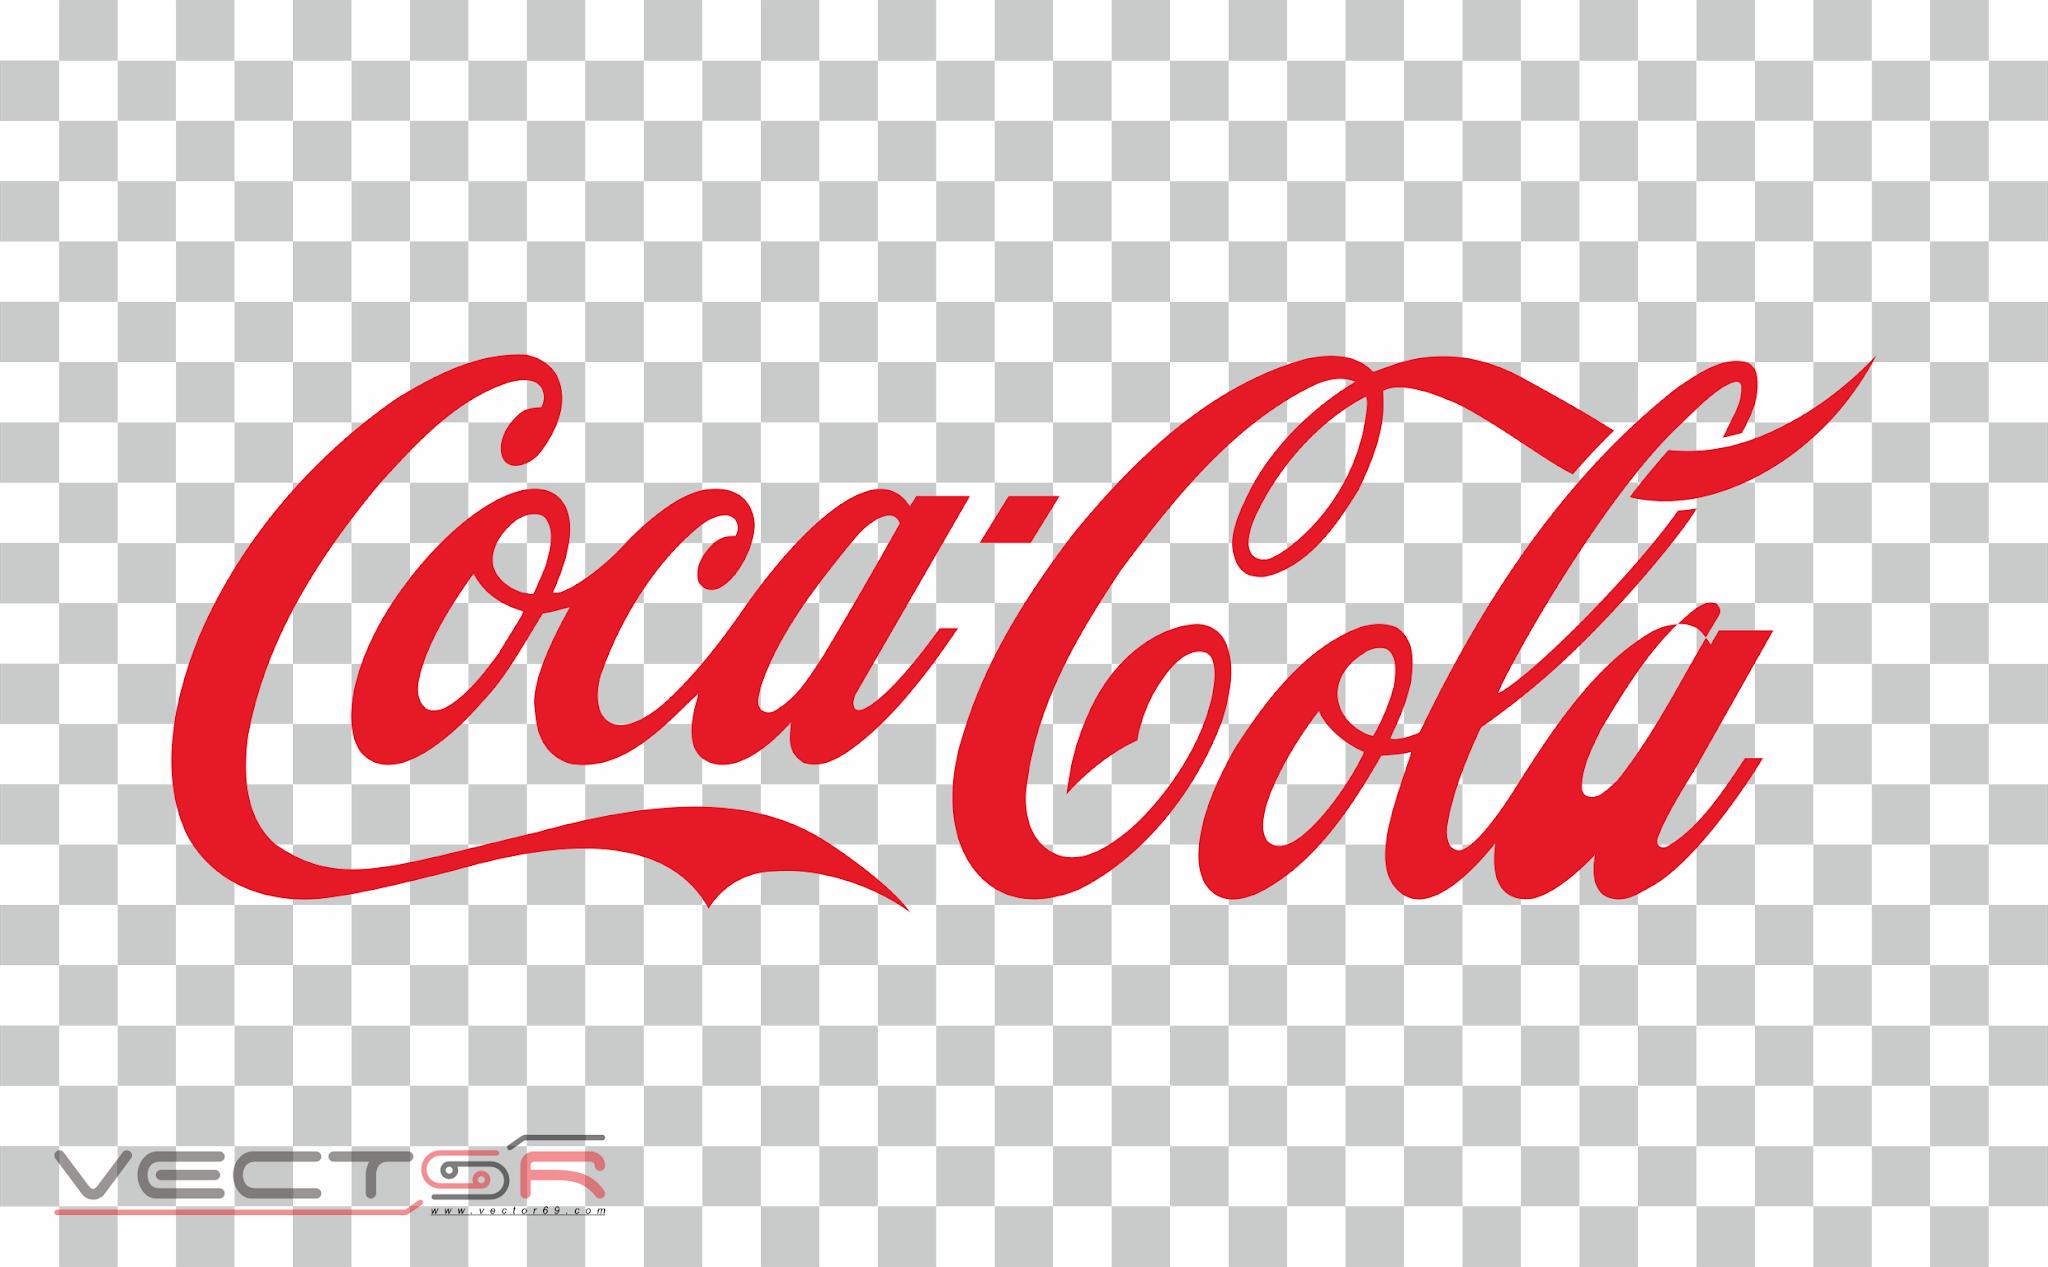 Coca-Cola Logo - Download .PNG (Portable Network Graphics) Transparent Images